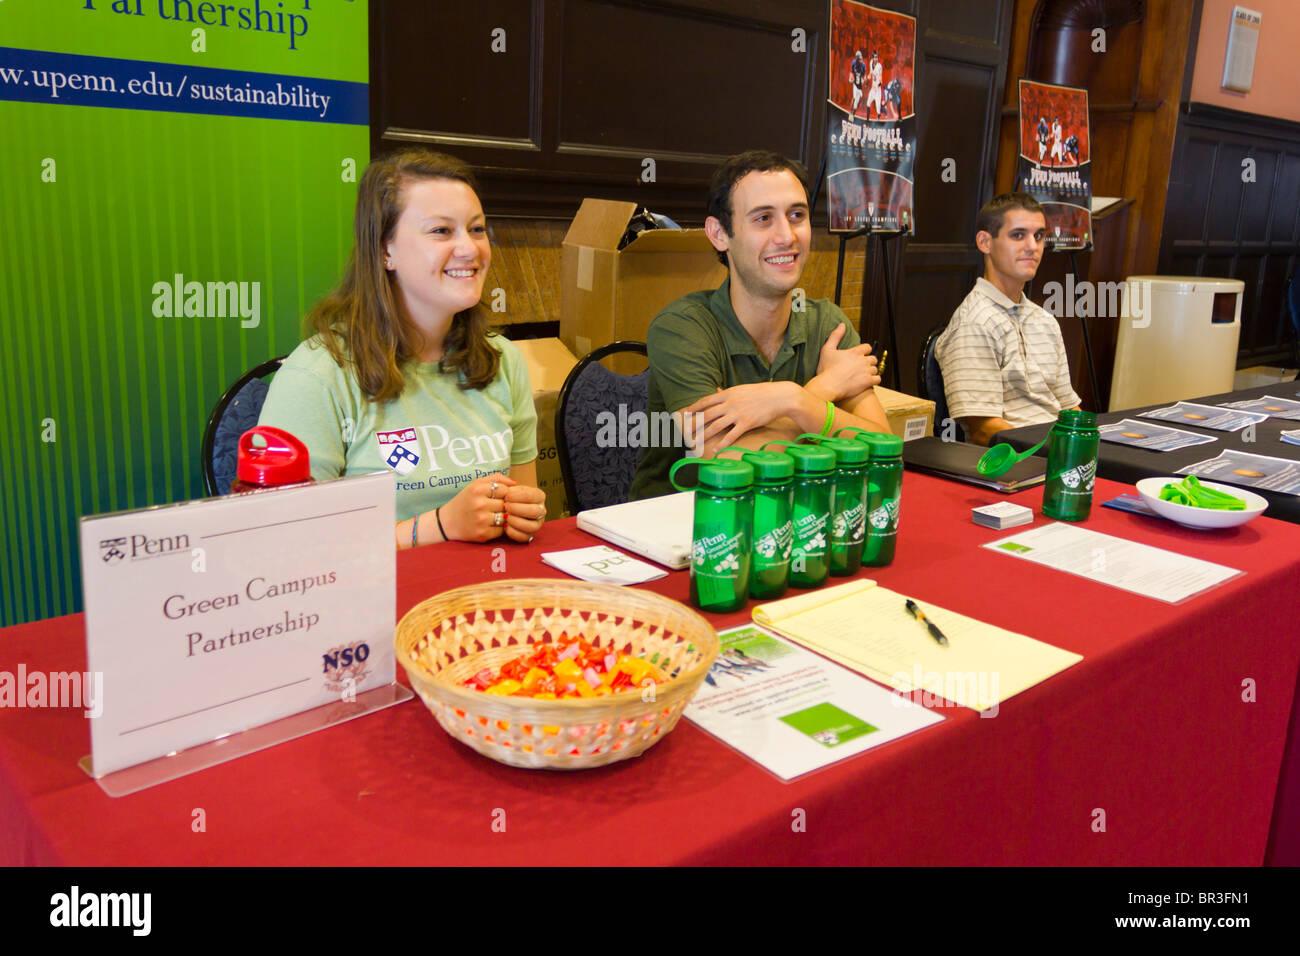 Green Campus Partnership table at student orienatation session at University of Pennsylvania, Philadelphia, USA - Stock Image